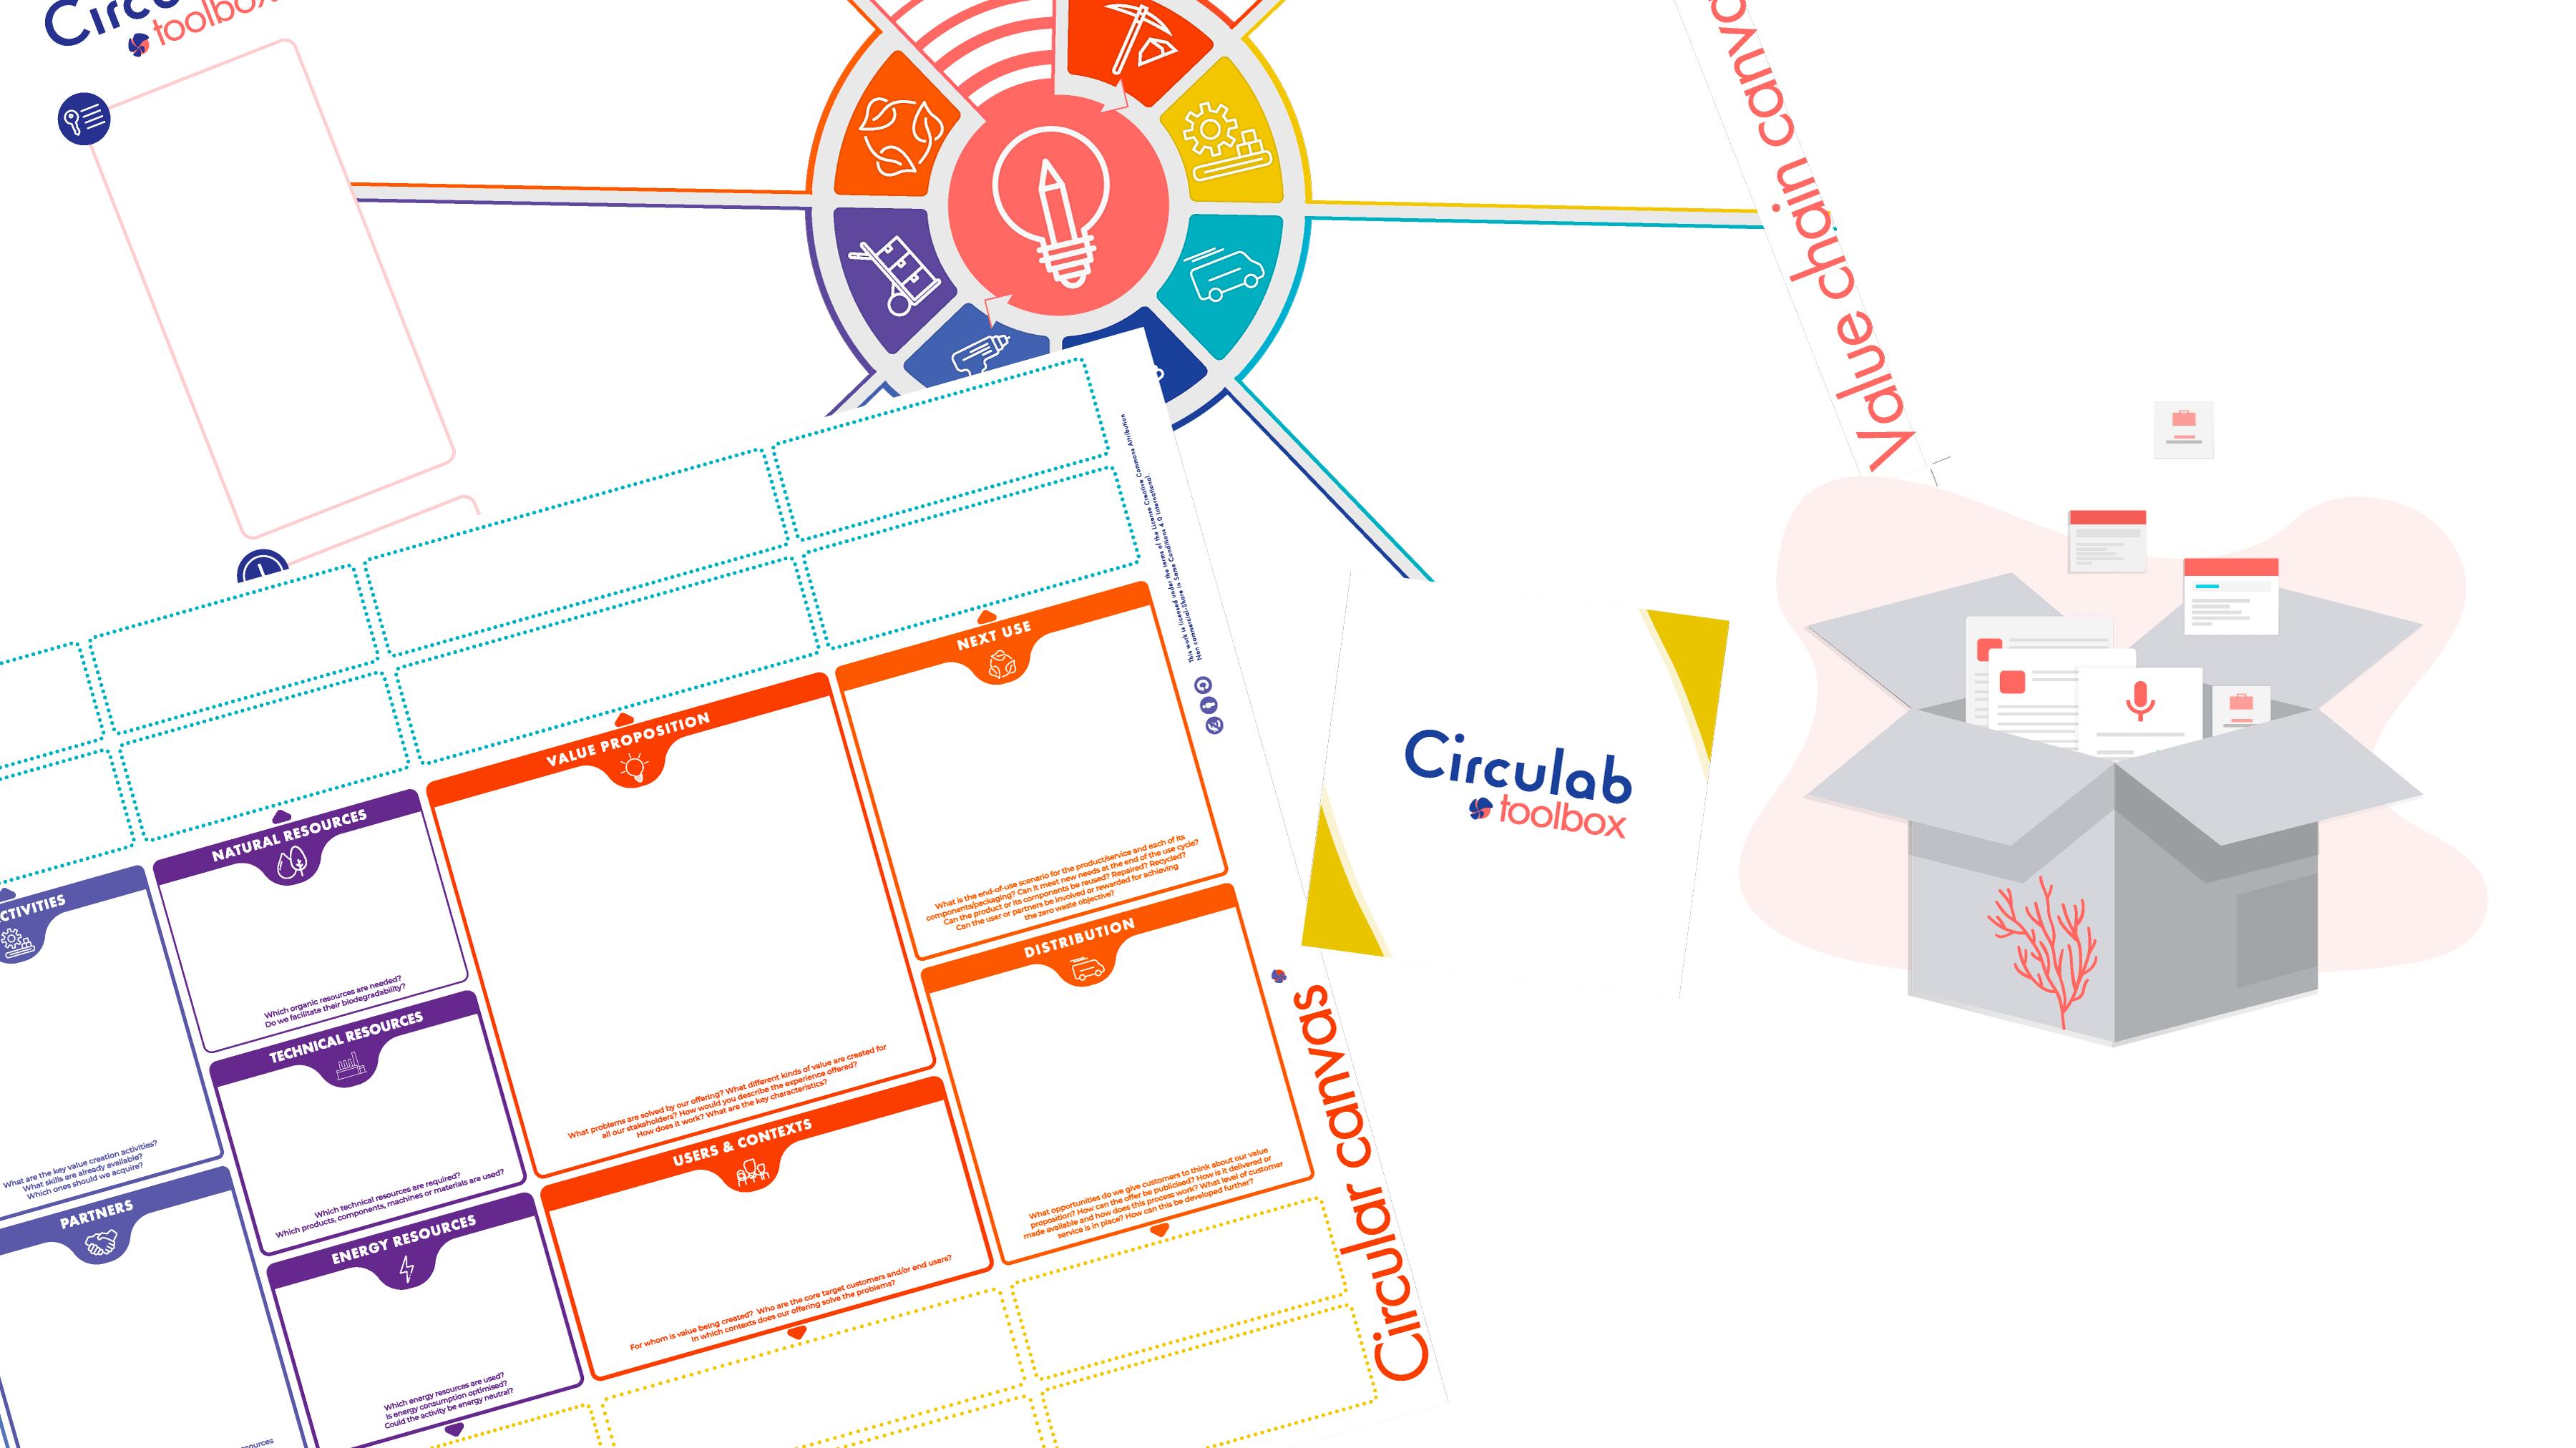 Aperçu des outils Circulab